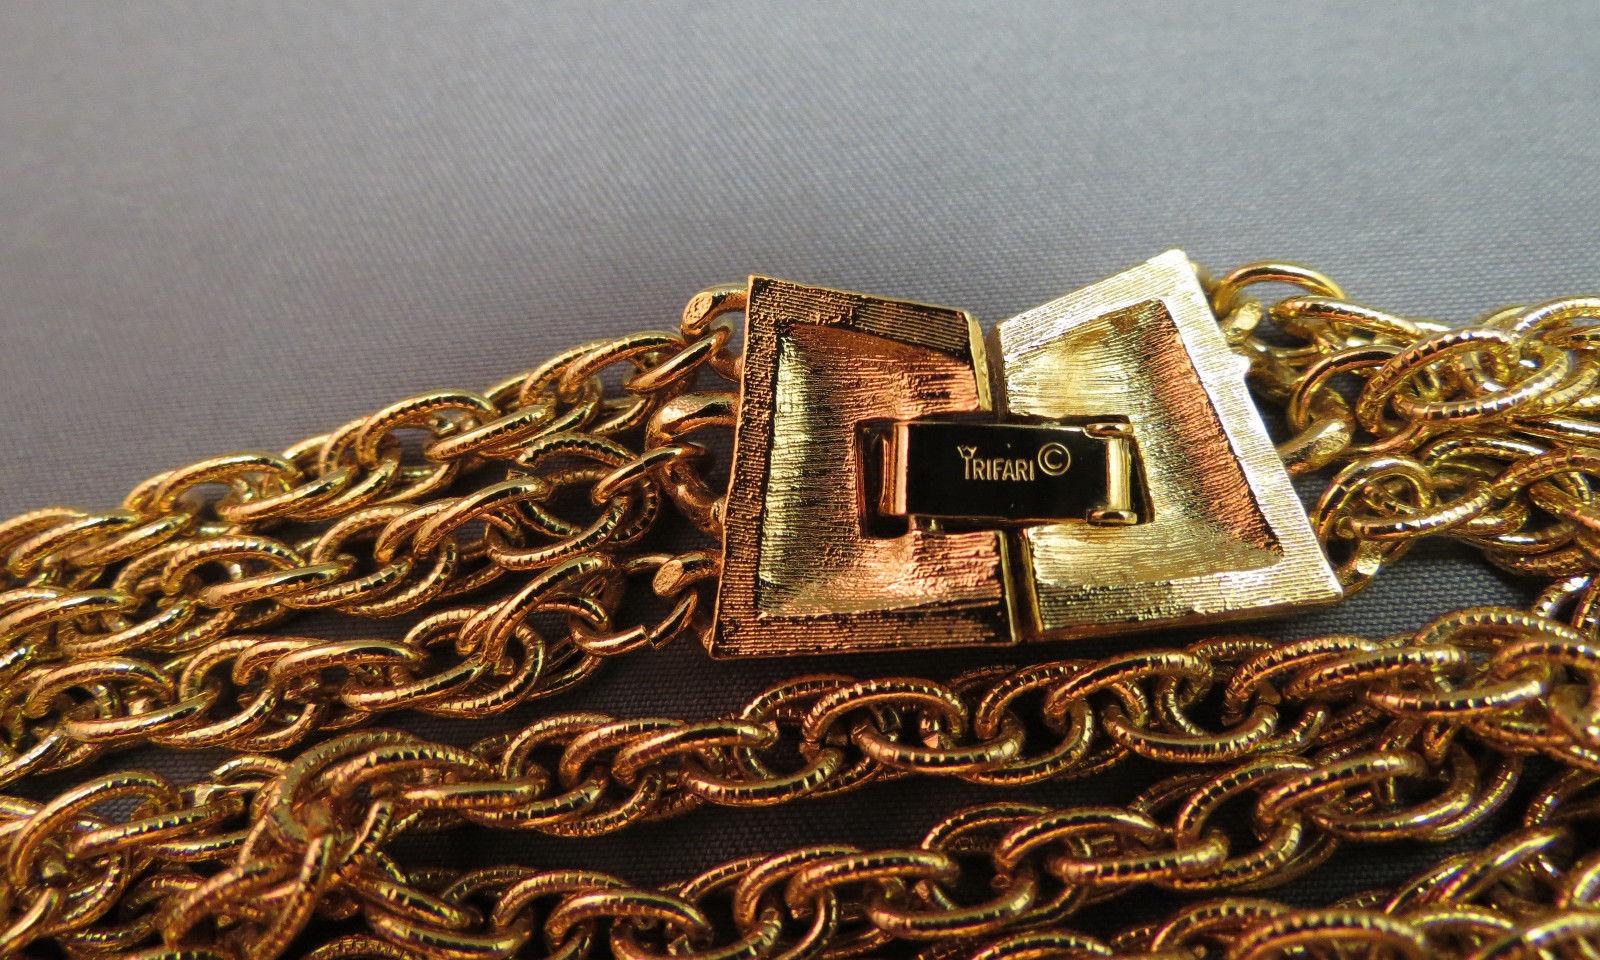 VTG Crown Trifari Necklace Mult Chain Gold Plate Couture Torsade Festoon NICE